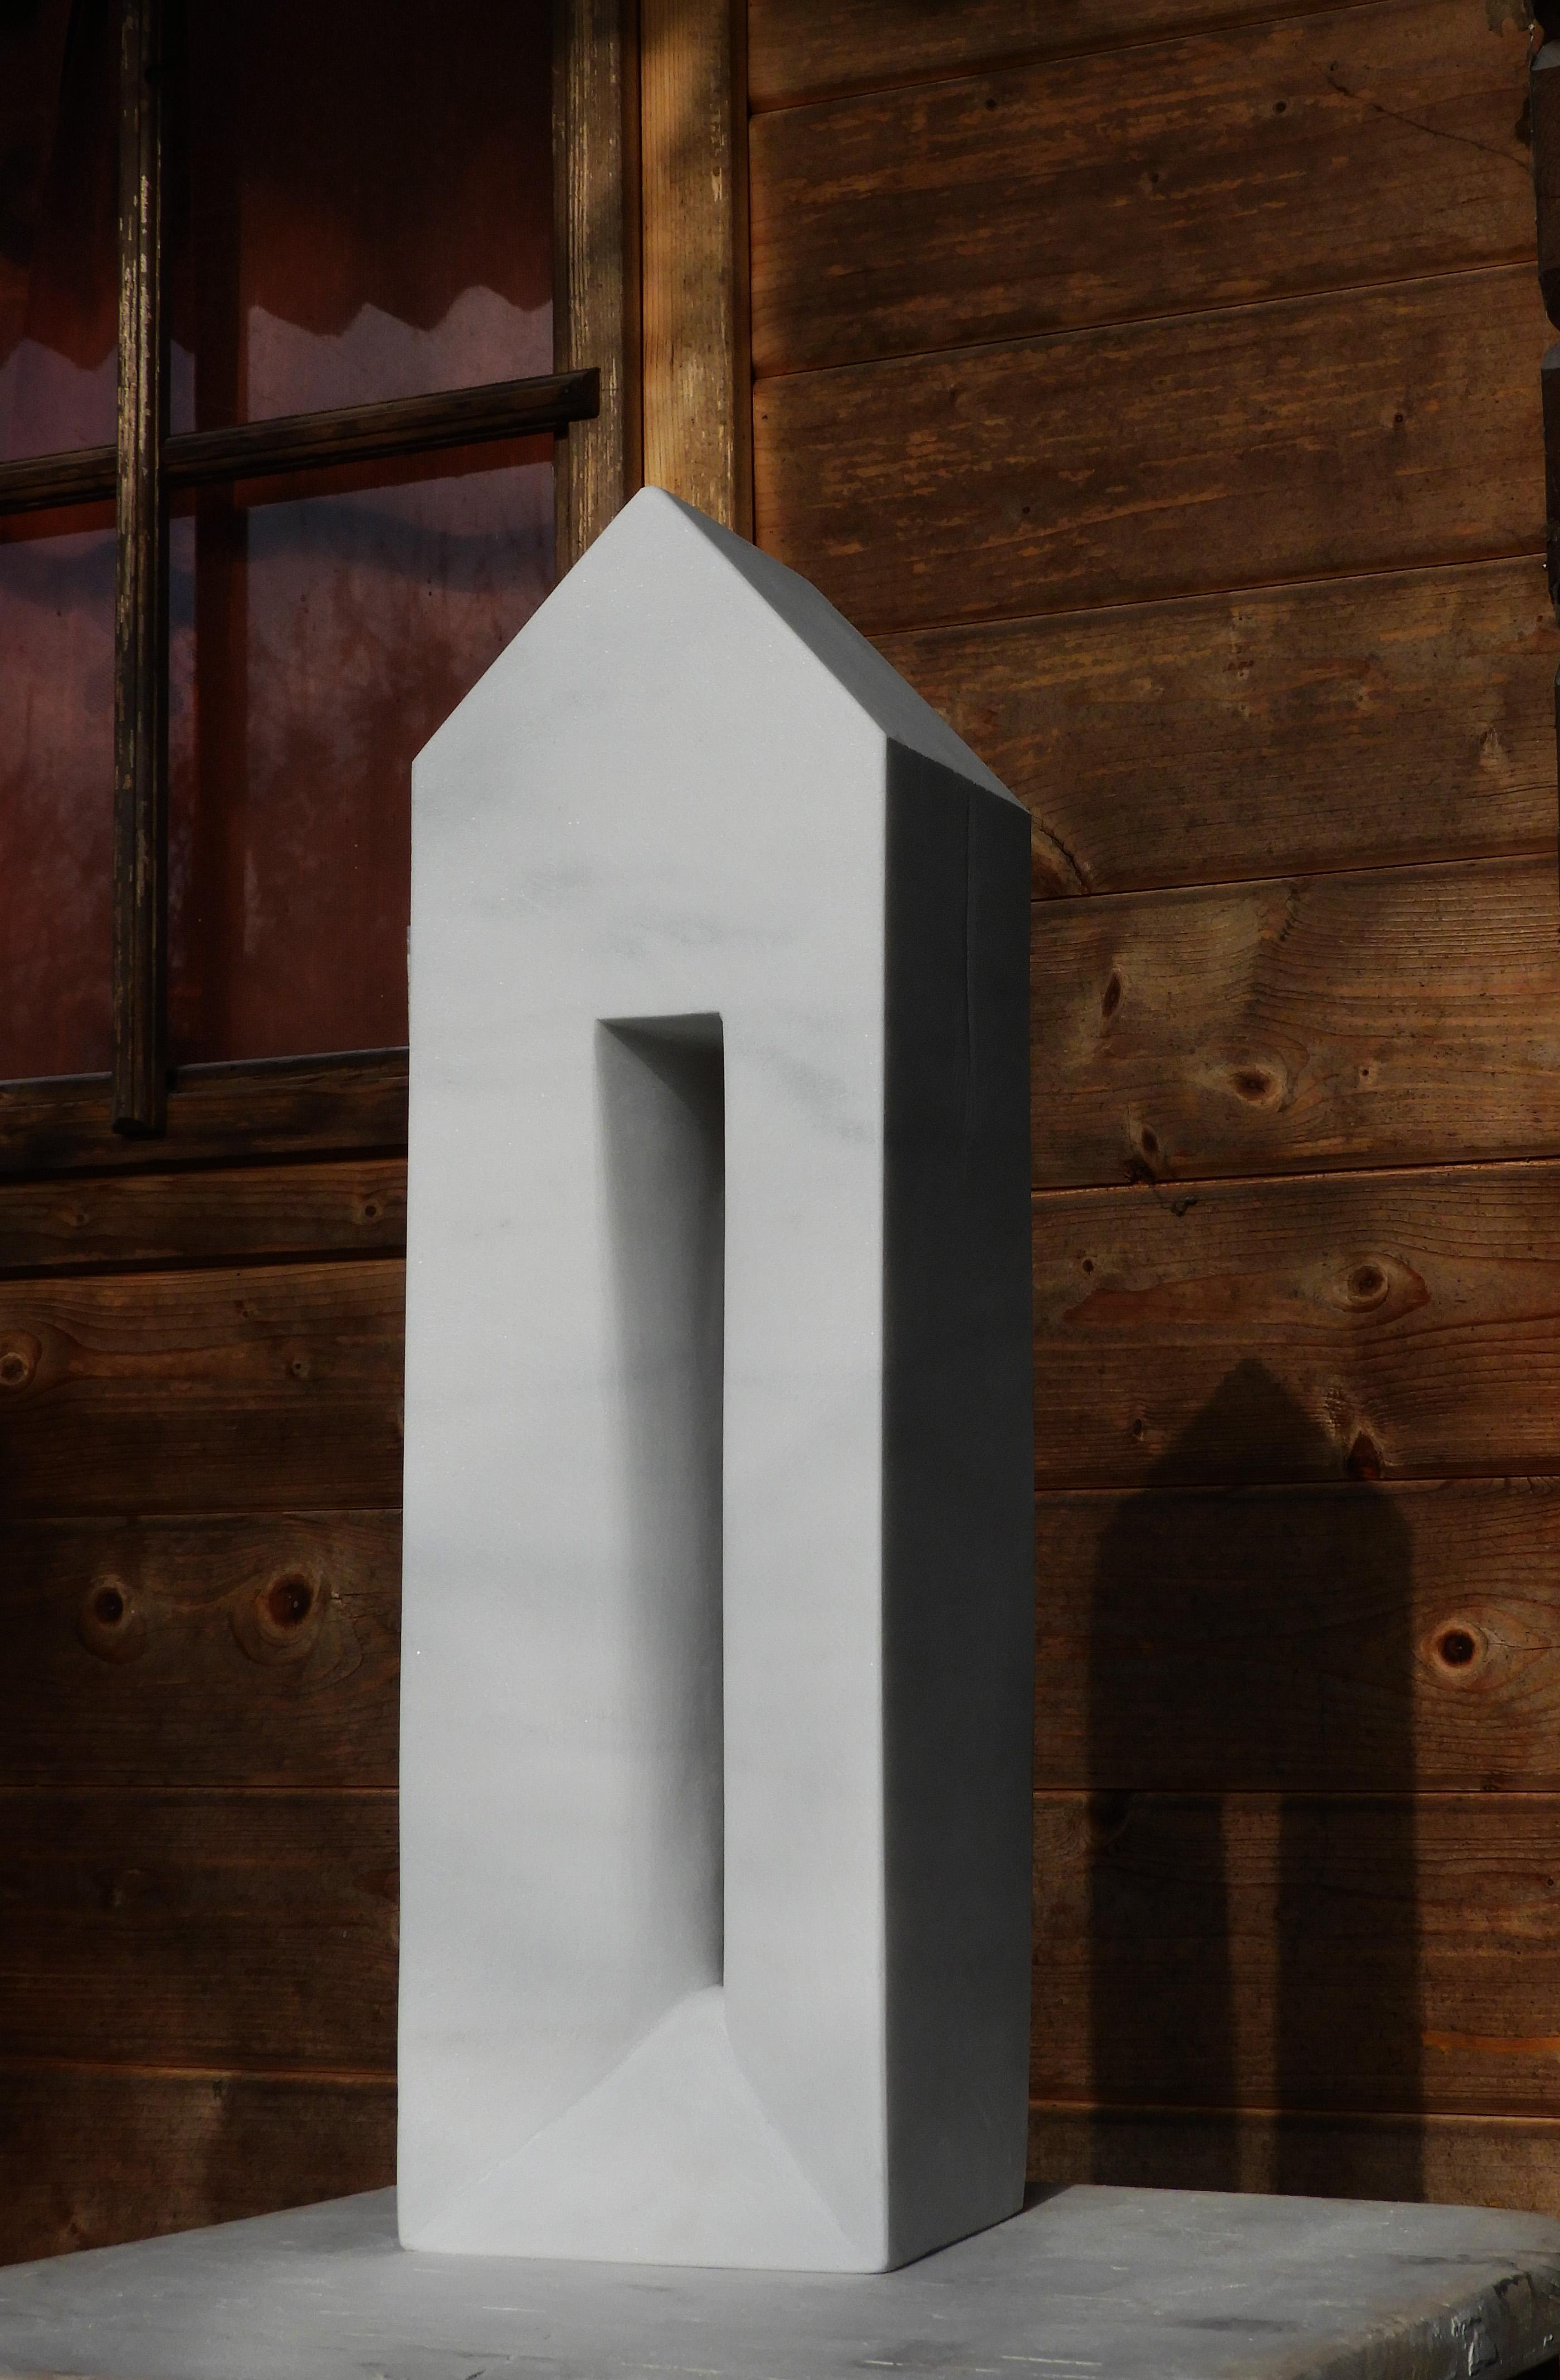 Intimately - h 49 x 14,5 x 12 cm  Lasa marble  2020